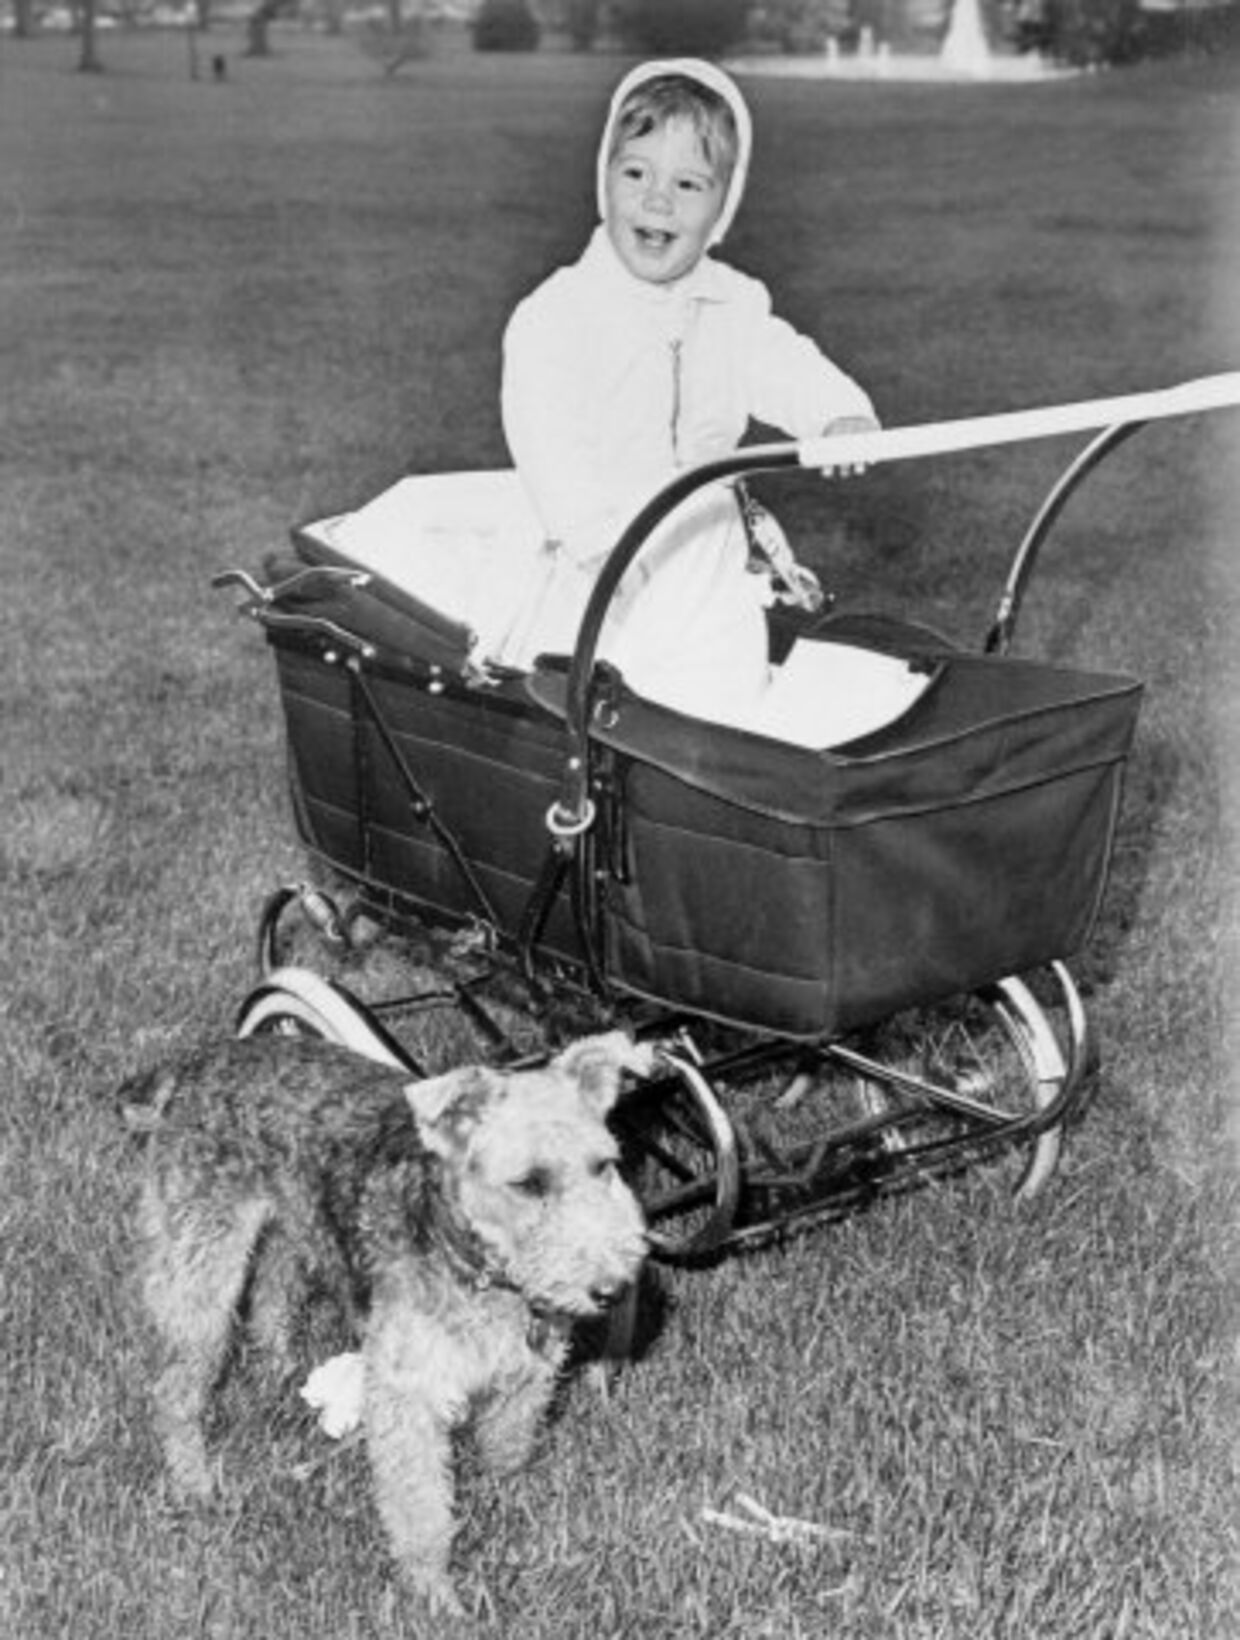 Et år gamle John F. Kennedy Jr., søn af president John F. Kennedy, sammen med familiens hund.